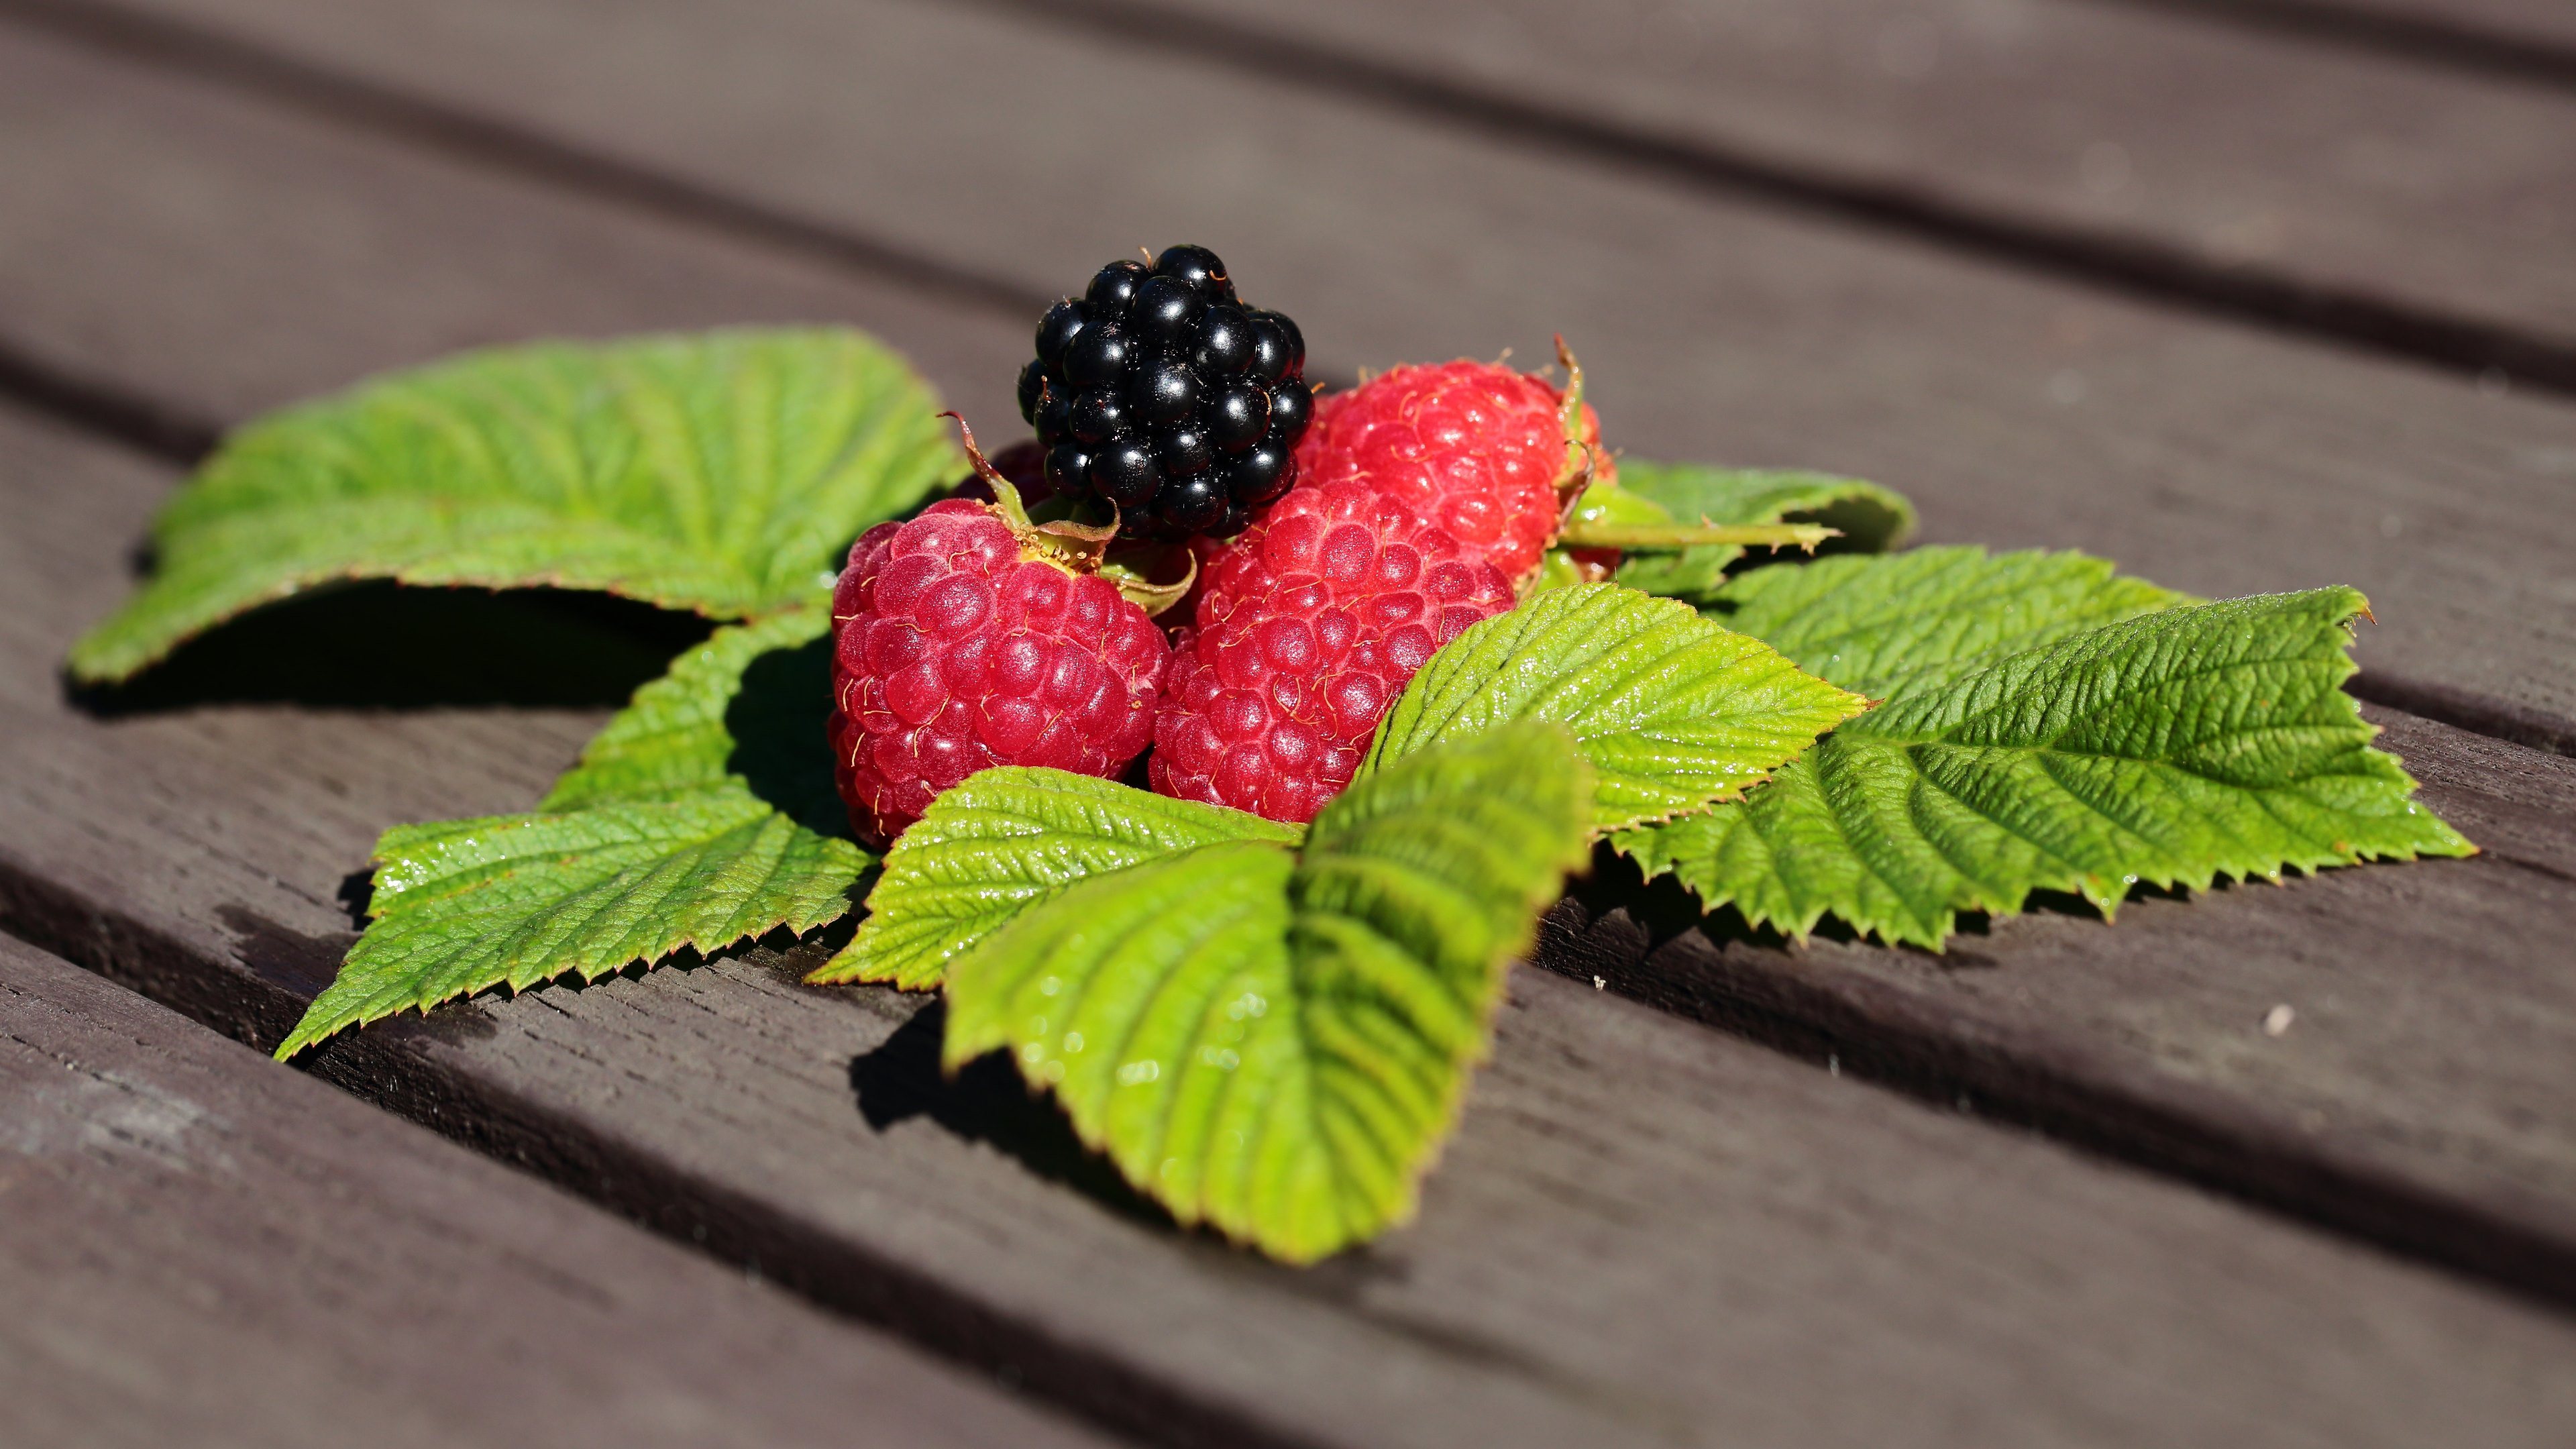 blackberry fruit tree wallpaper. wallpaper: forest fruits. raspberries and blackberry. ultra hd 4k 3840x2160 blackberry fruit tree wallpaper